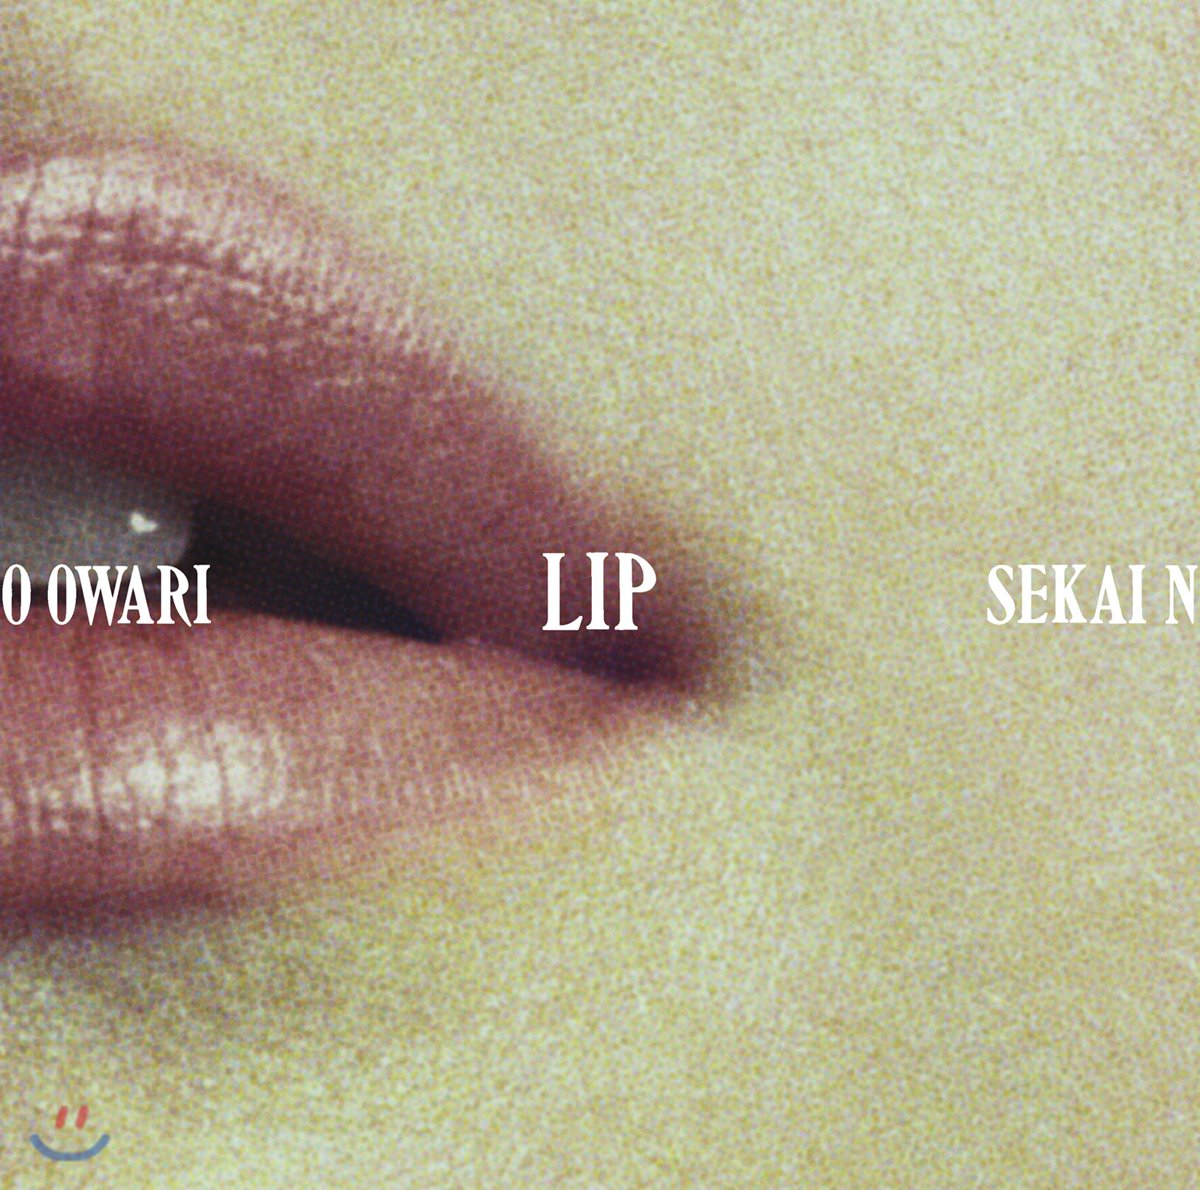 Sekai No Owari (세카이노오와리) - Lip